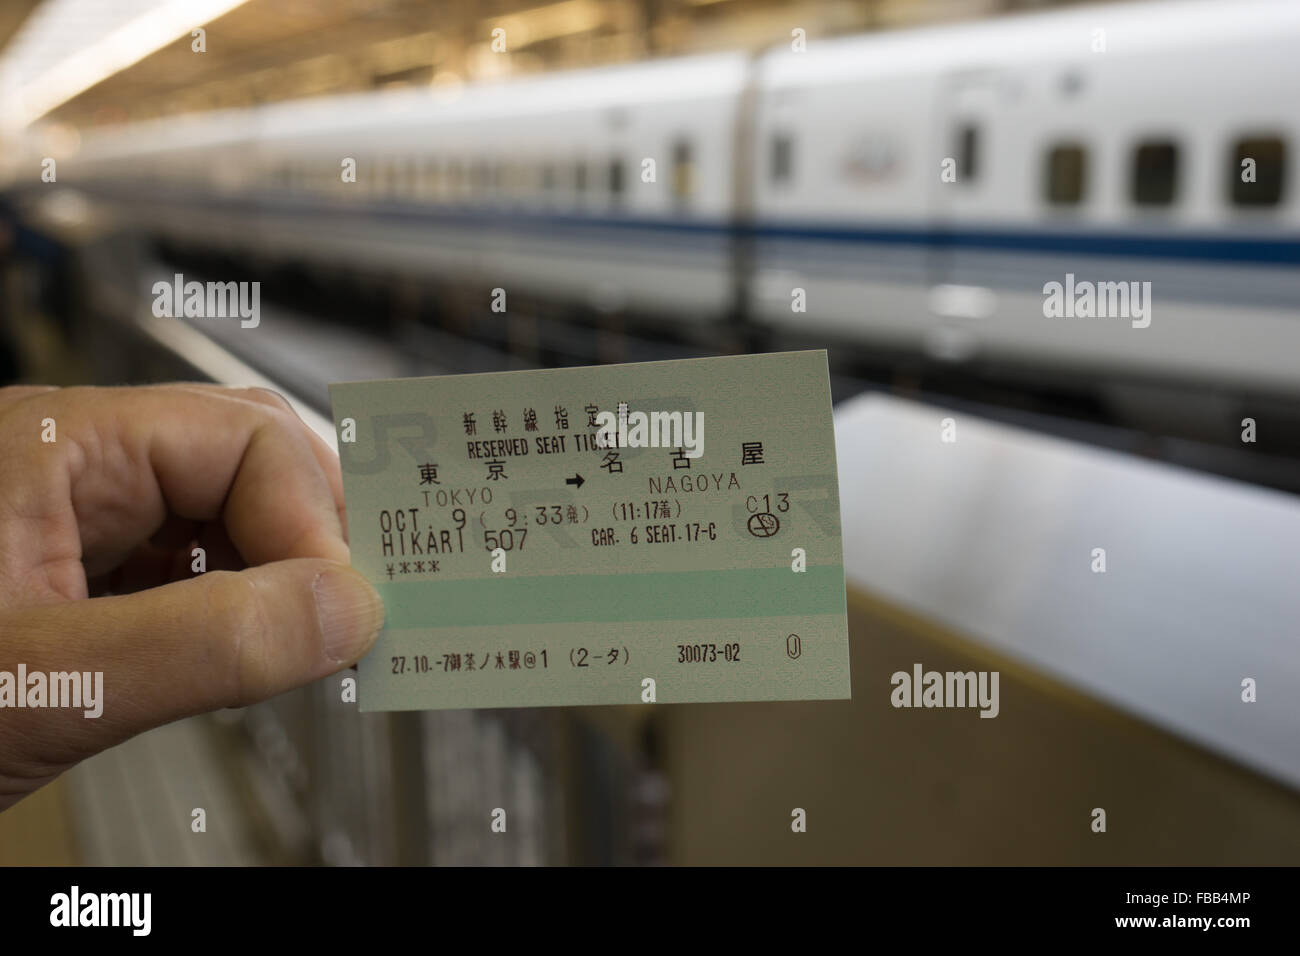 Shinkansen  bullet train in Tokyo with ticket - Stock Image